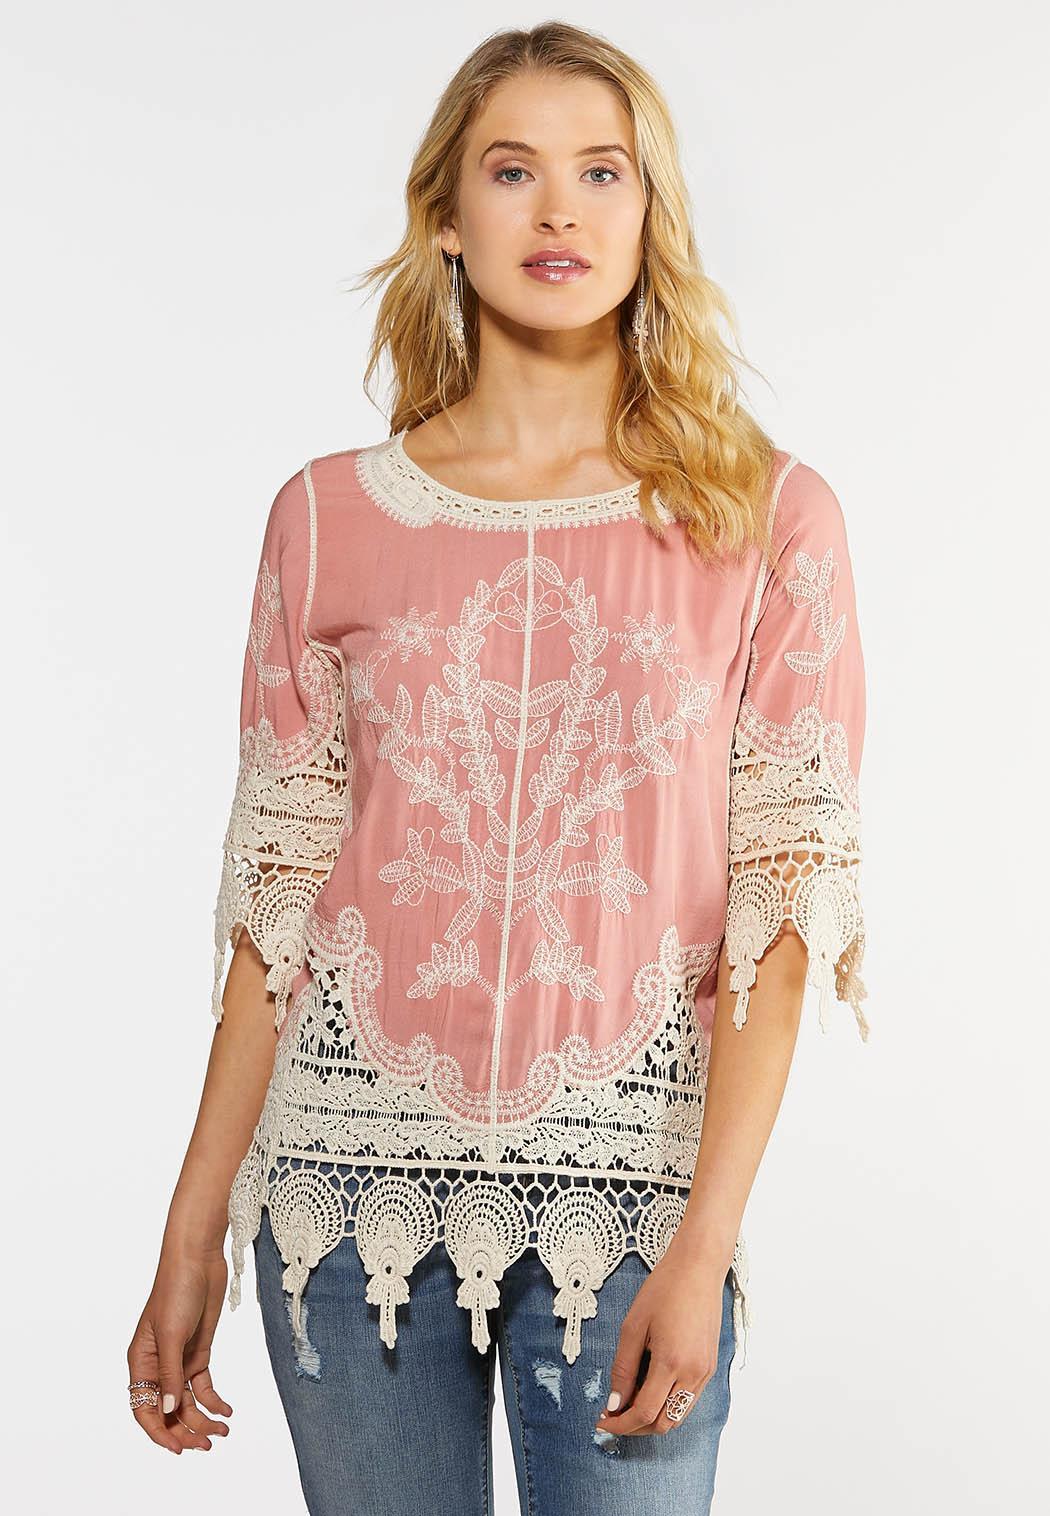 Plus Size Crochet Embroidered Tunic Tops Cato Fashions